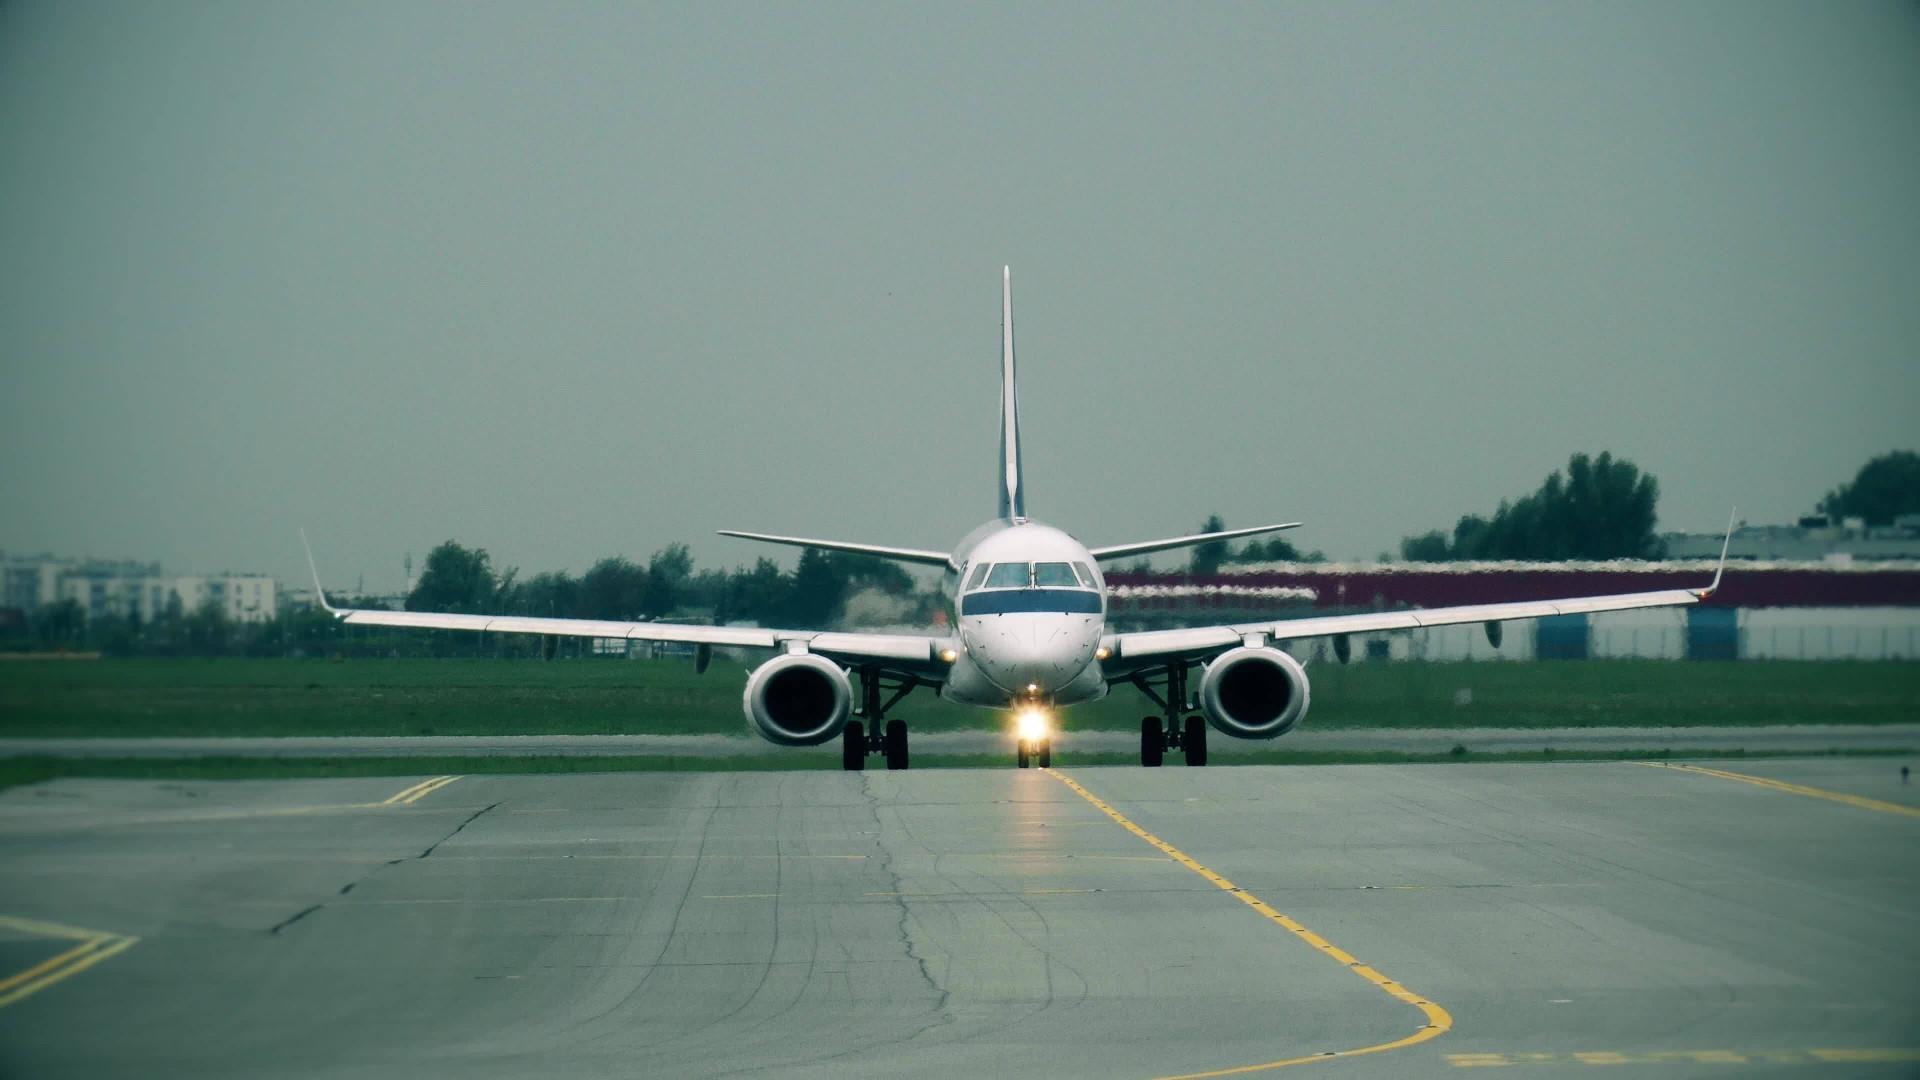 Authority slates organisation of fatal An-2 air show flight